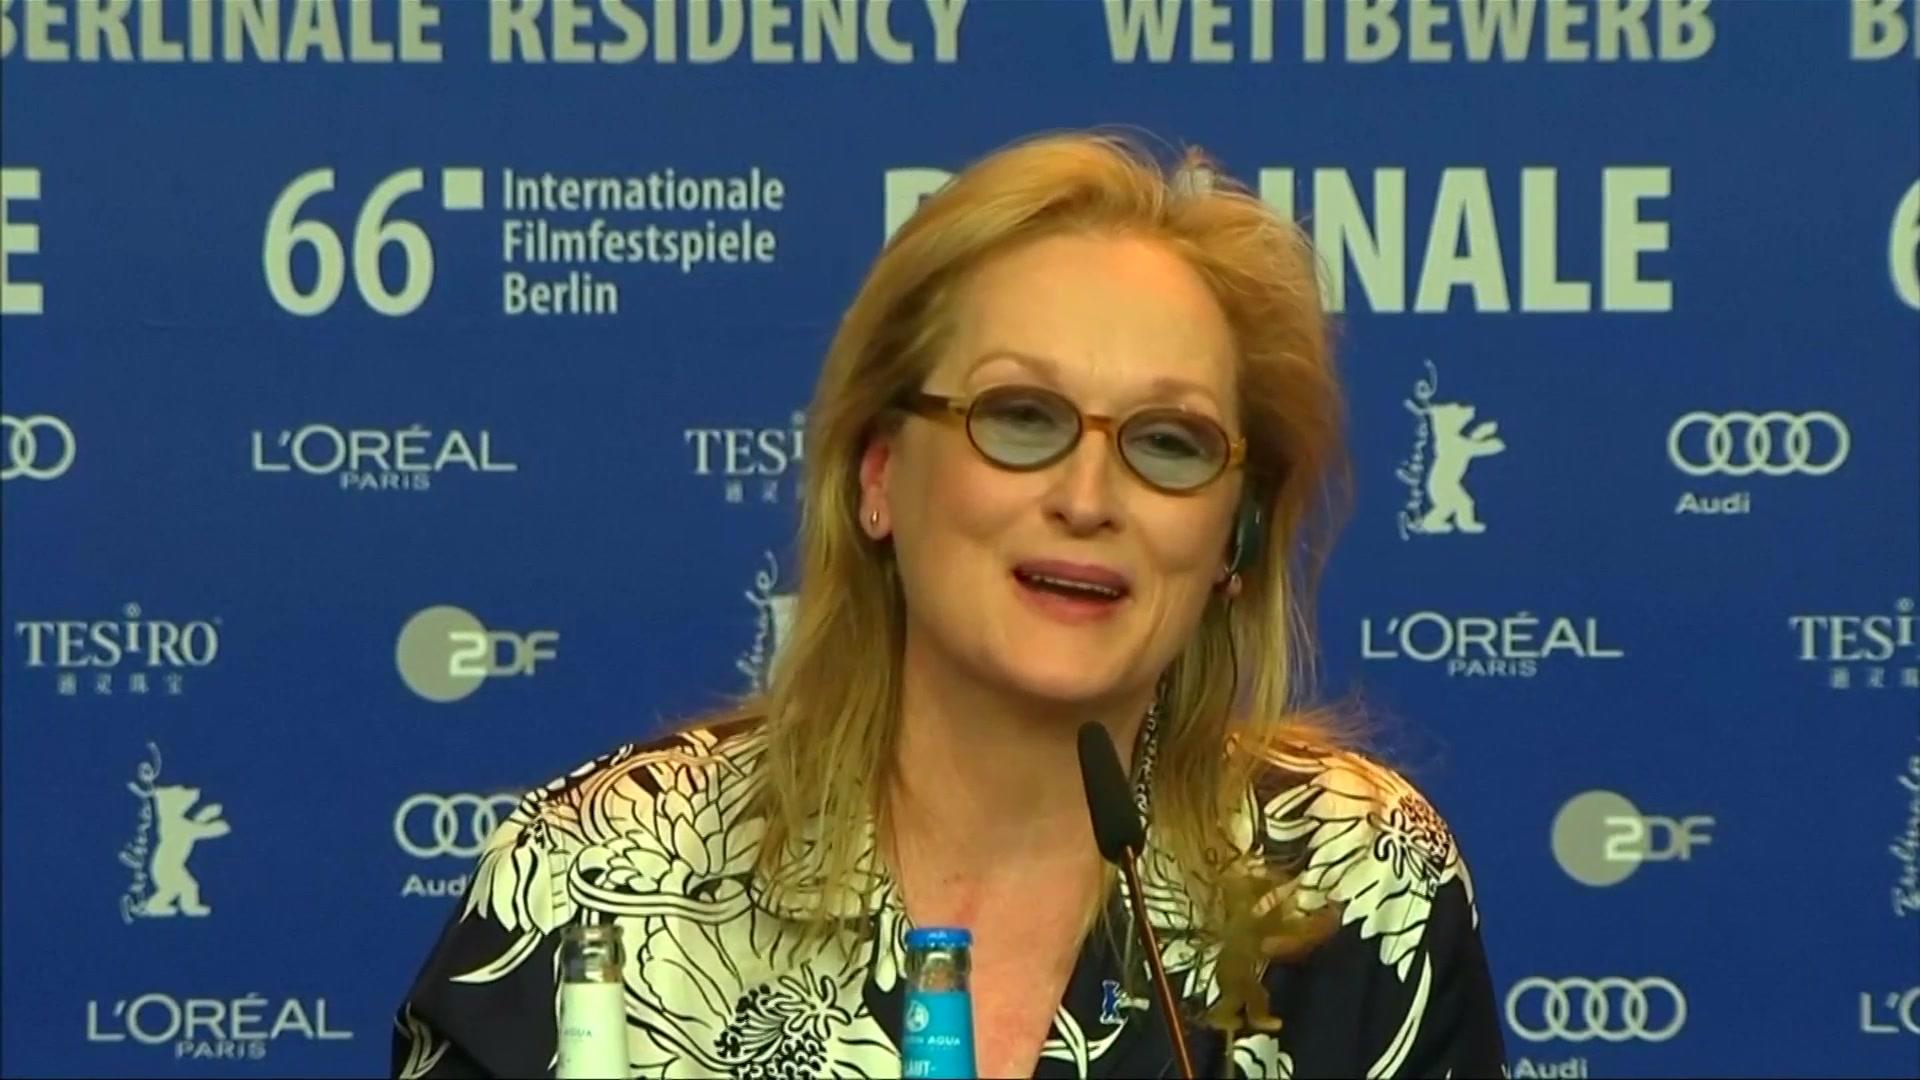 Meryl Streep Clarifies 'We're All Africans' Remark